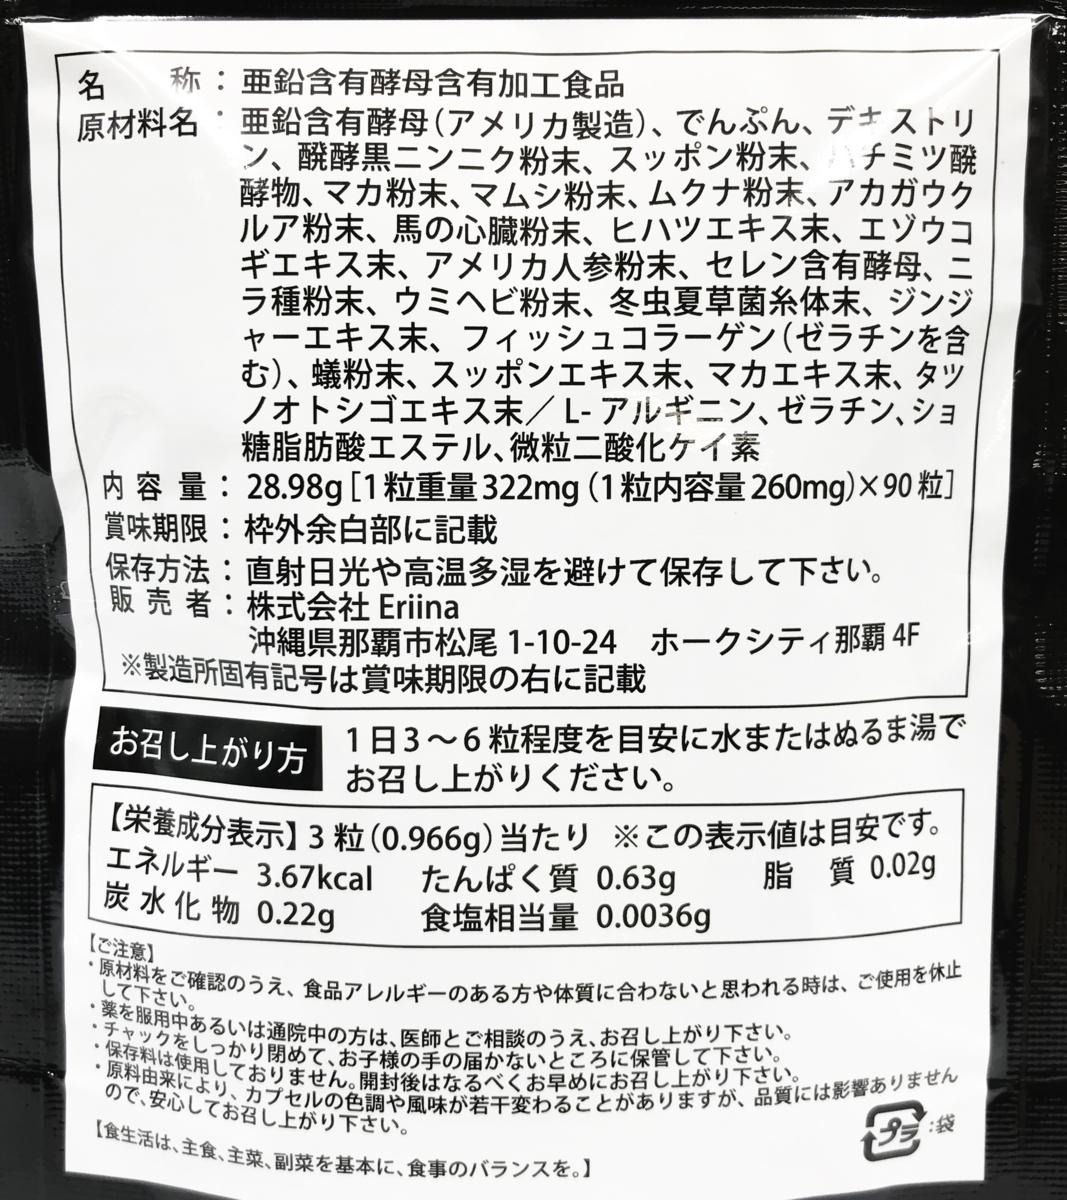 ▽ Eriina 滾り TAGIRI (亜鉛含有酵母含有加工食品) 90粒 賞味期限2021年11月迄 未開封品 ネコポス可_画像2